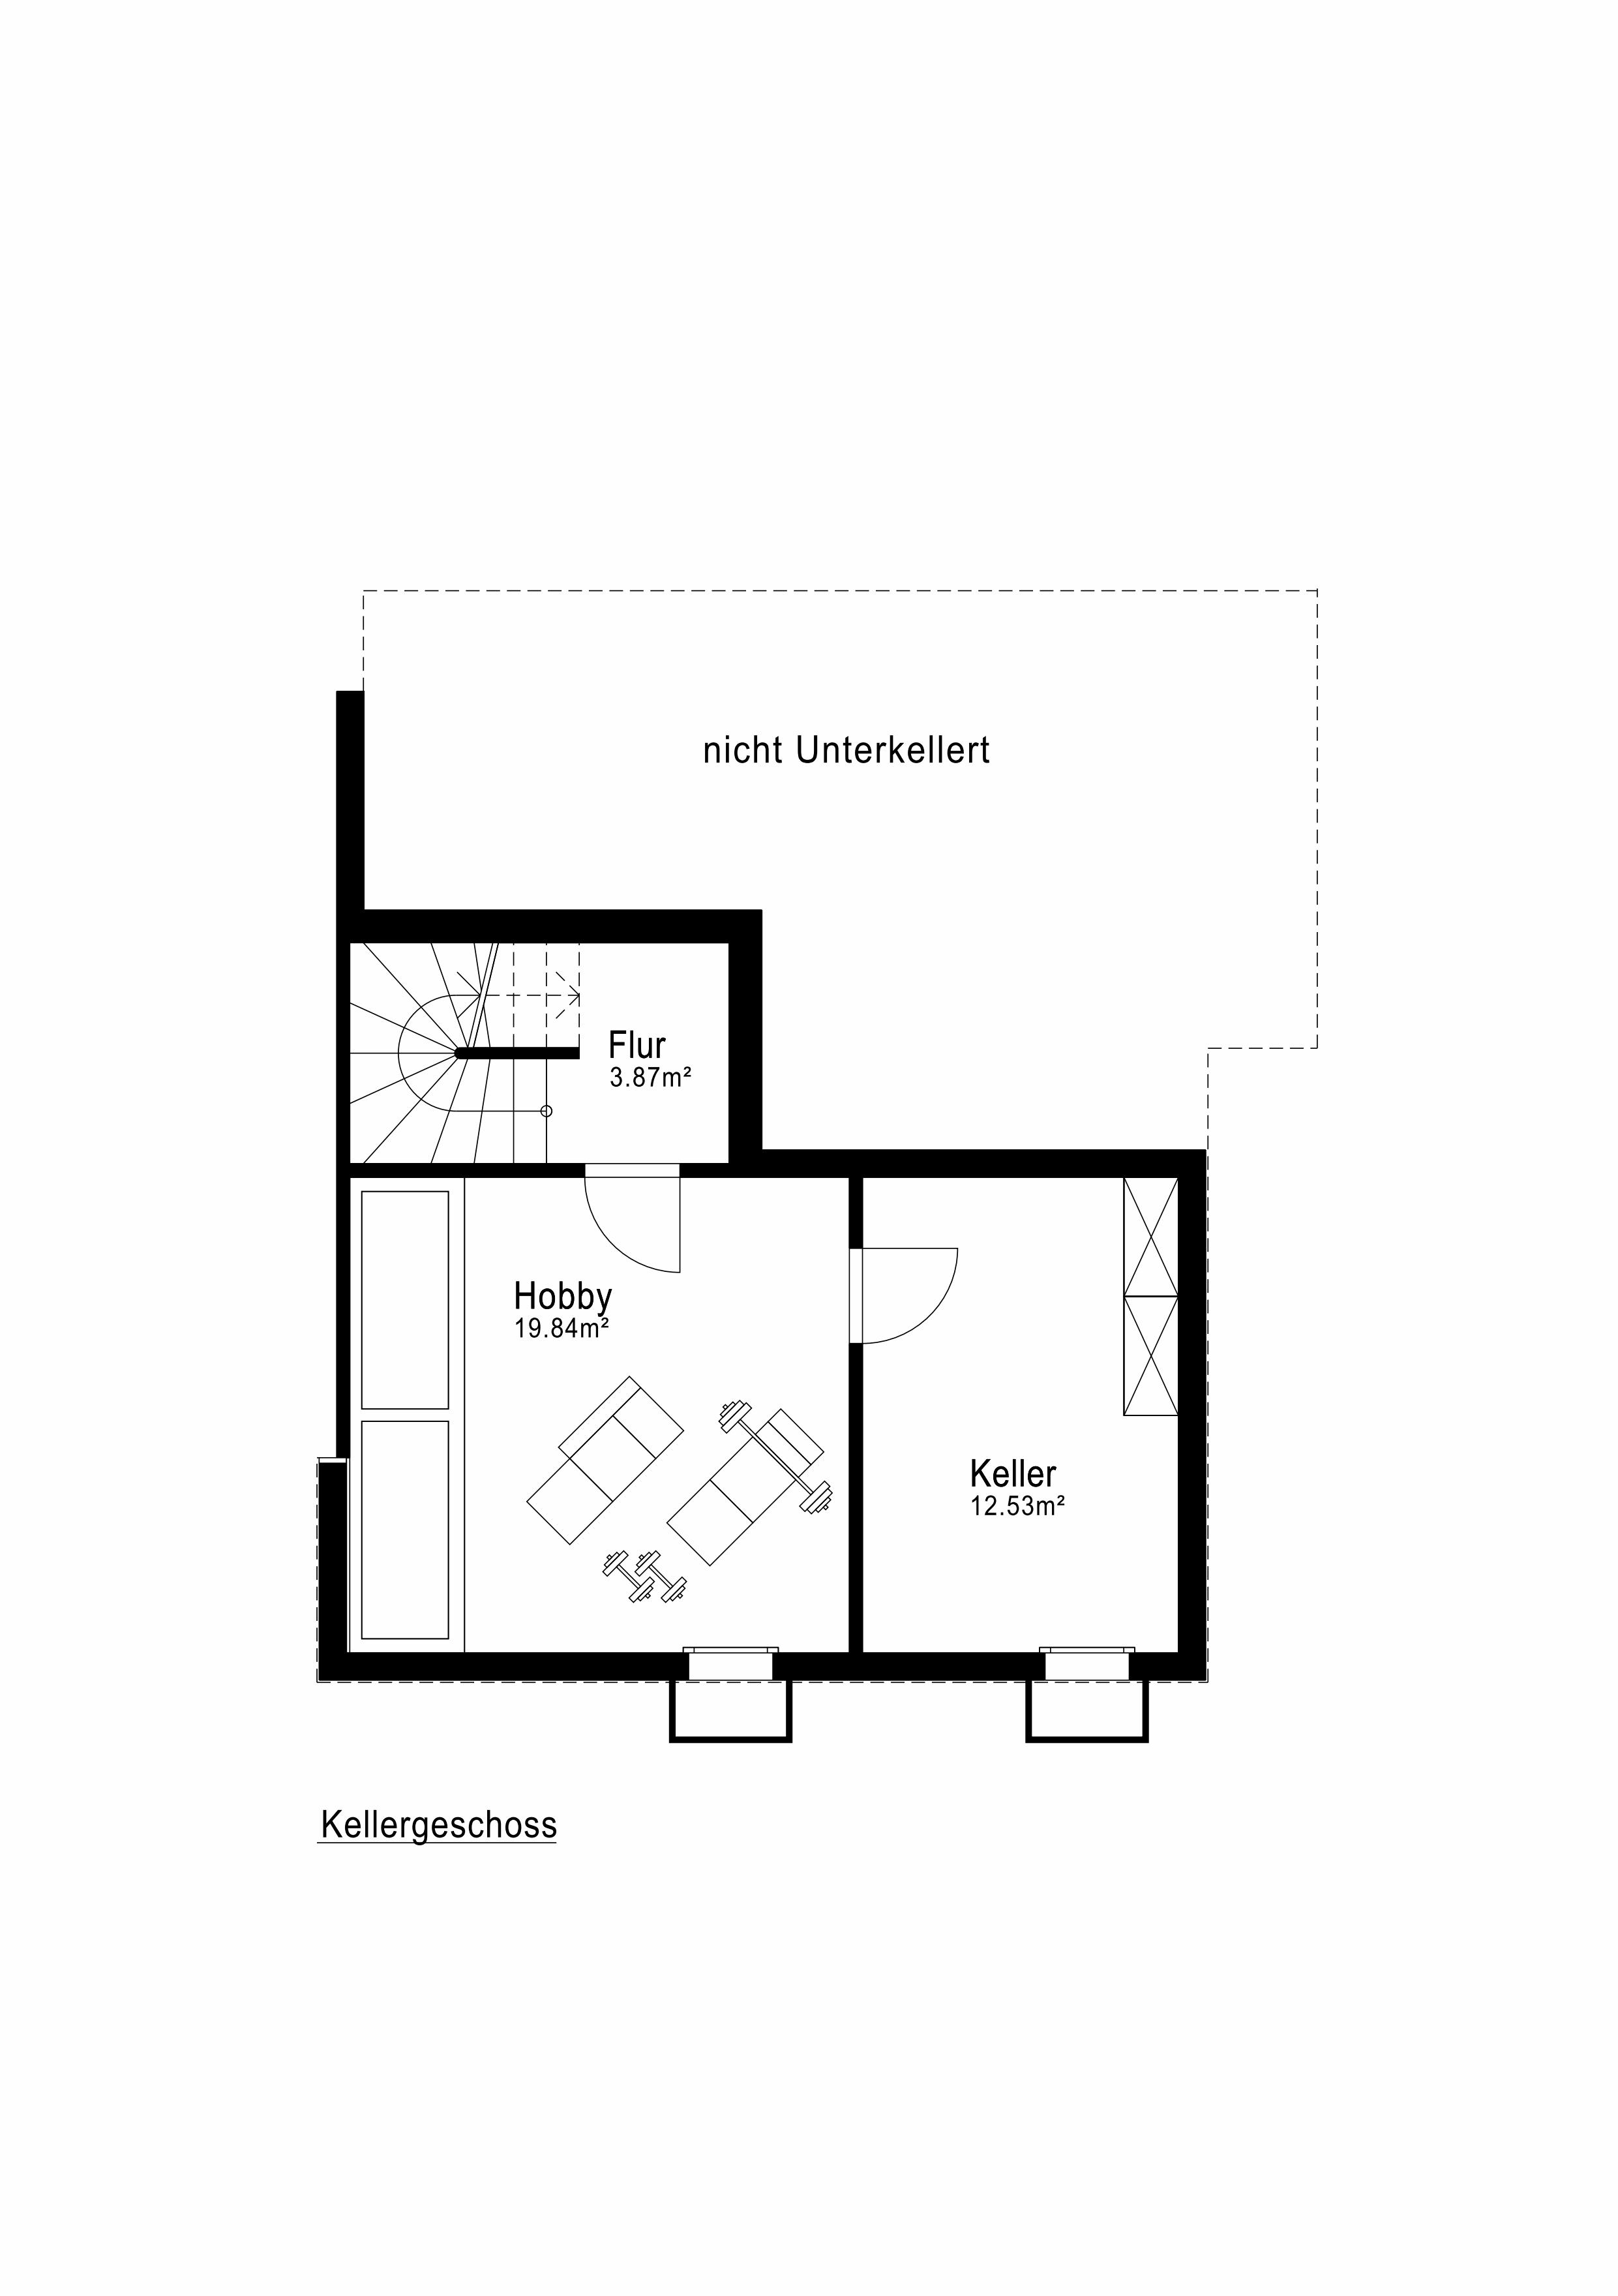 17_Obersee_Immobilien_Keller